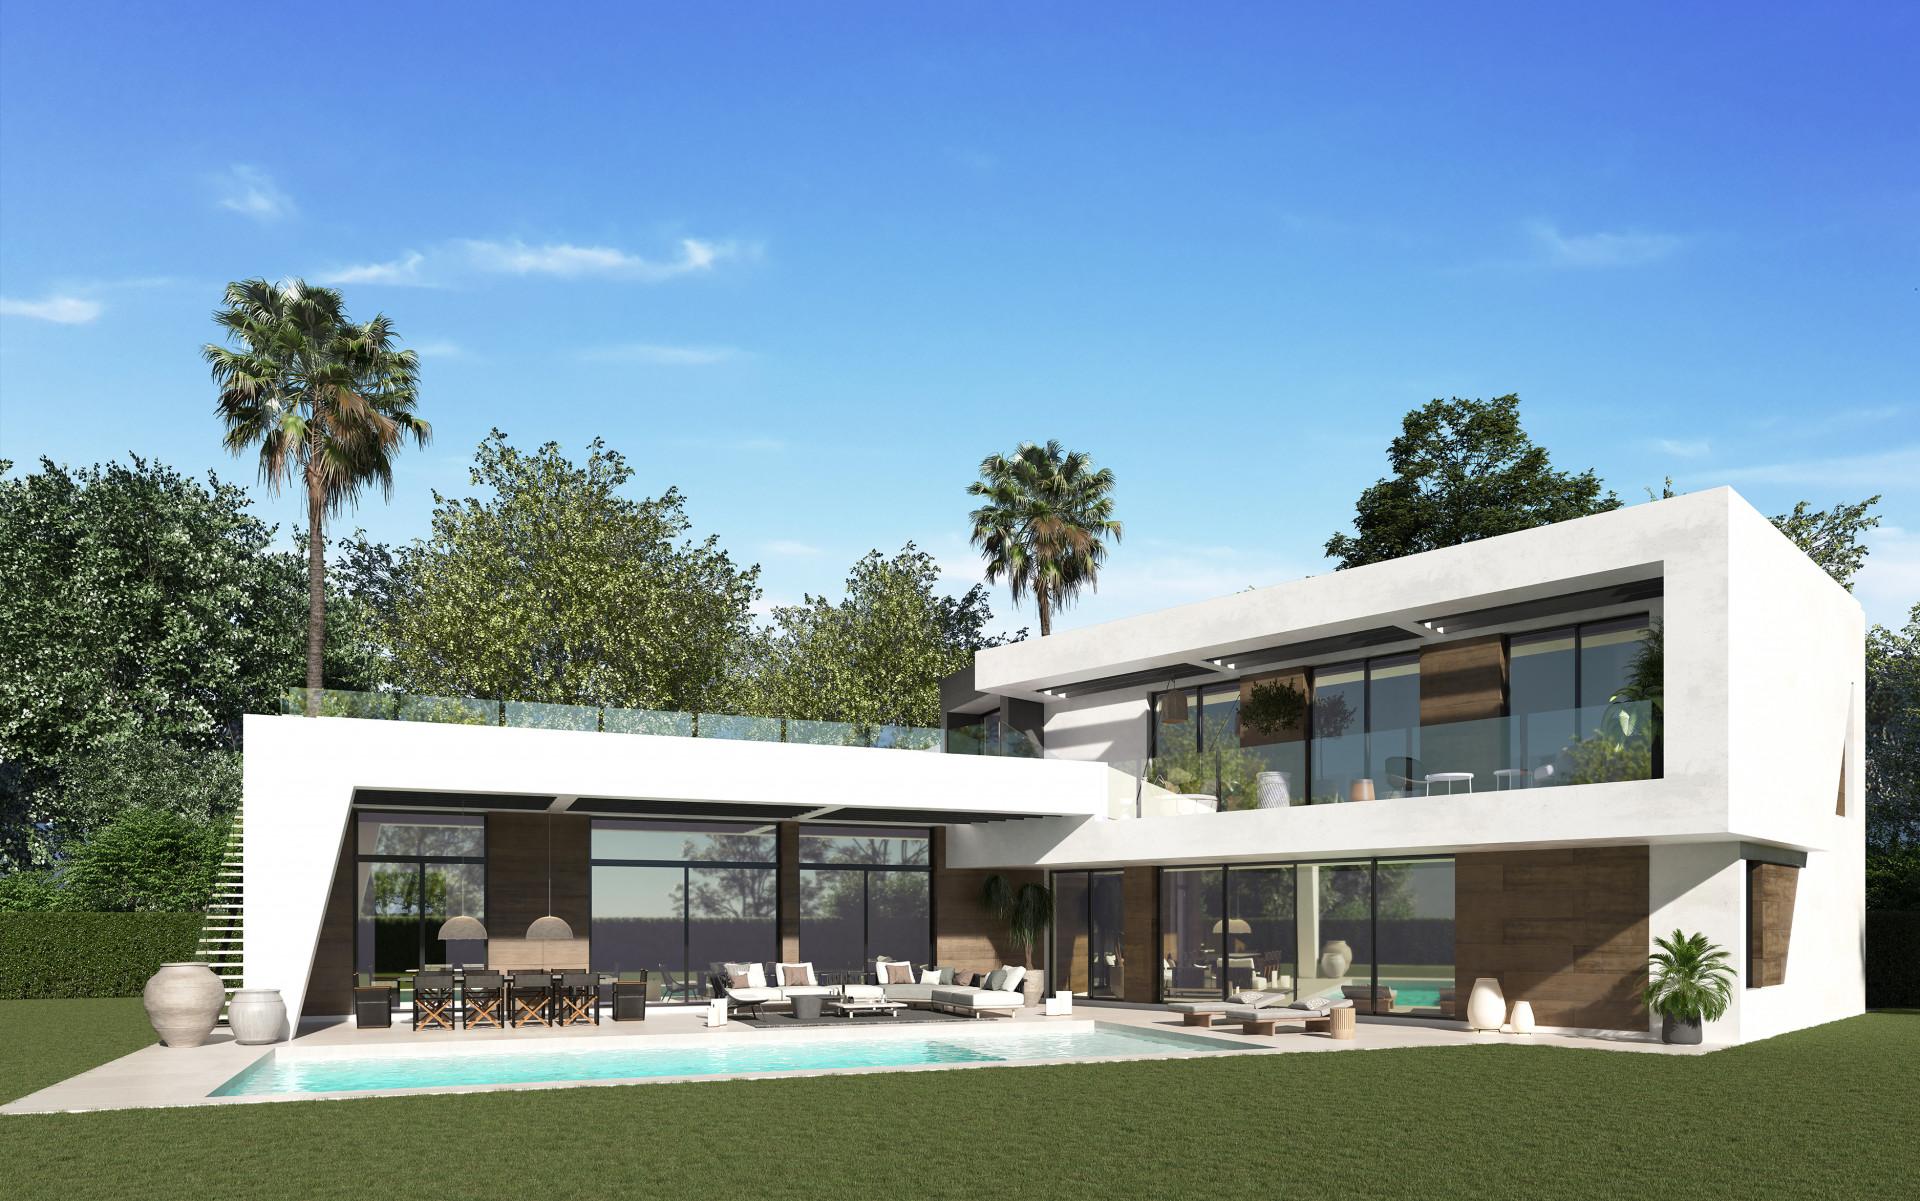 Off plan moderne villa te koop in Guadalmina Baja - San Pedro – Marbella